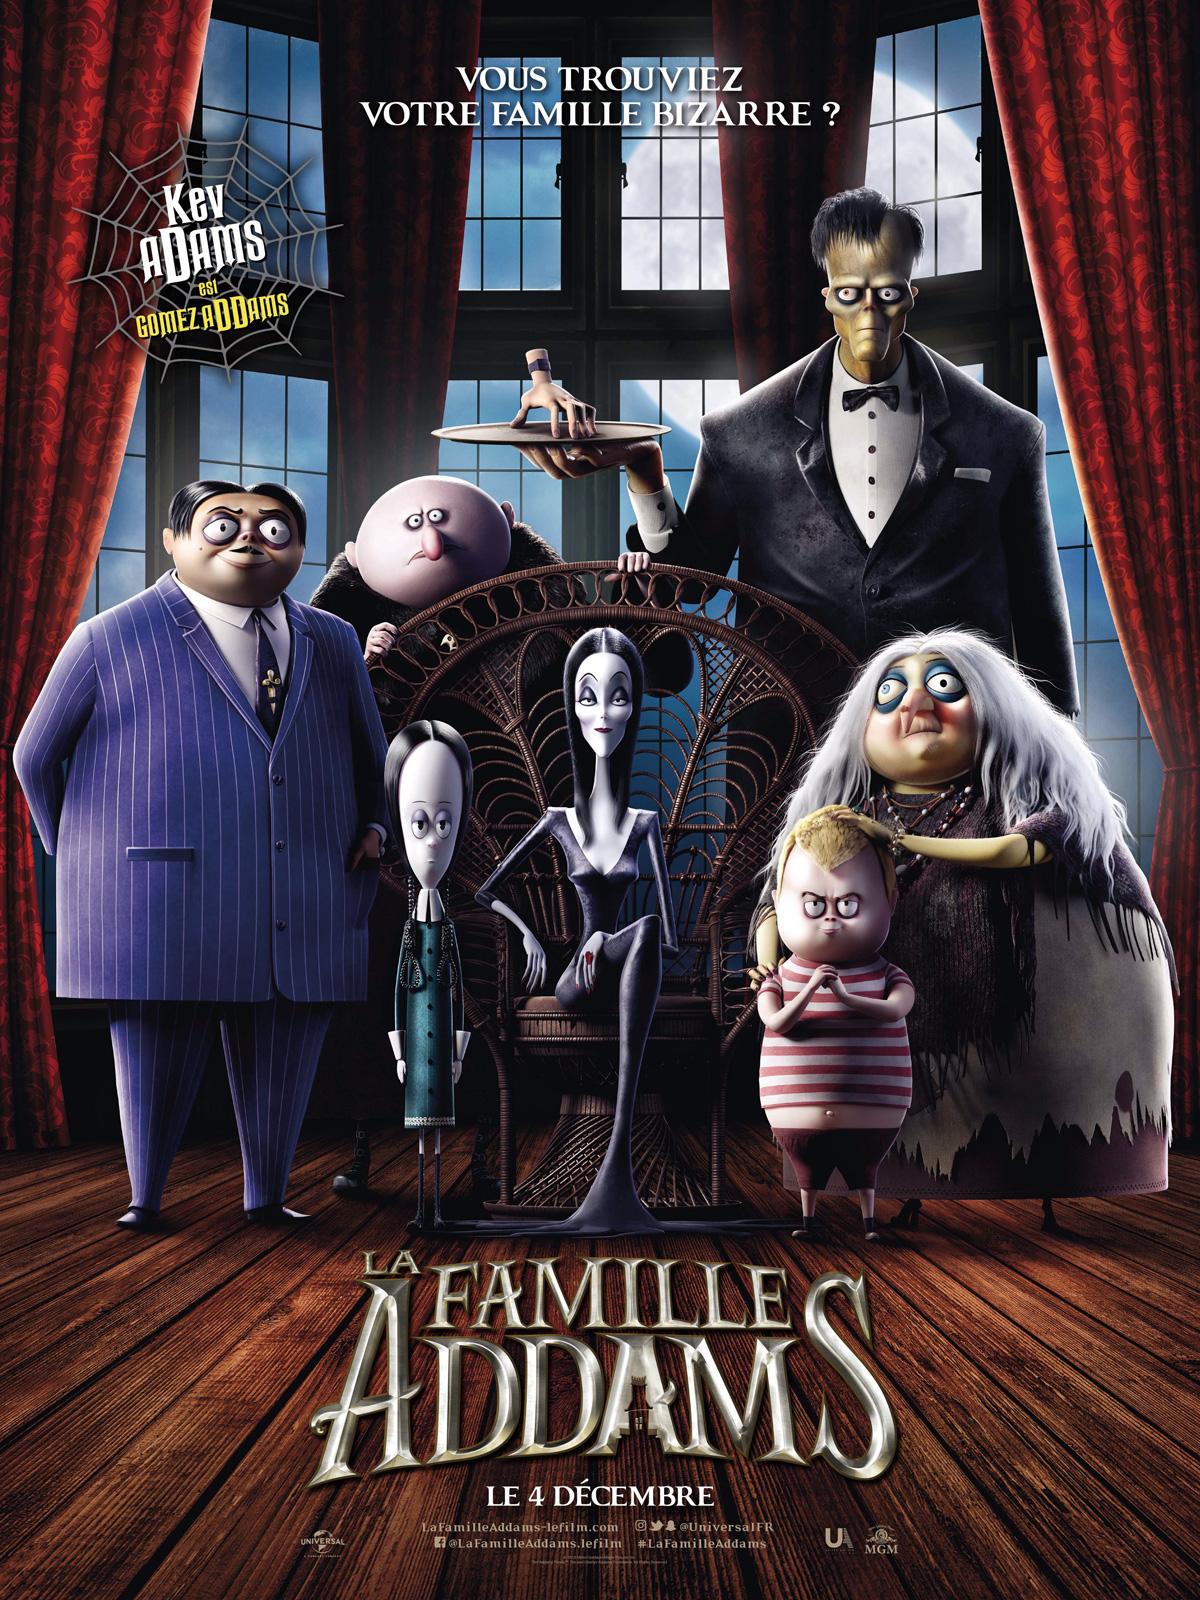 Les Valeurs De La Famille Addams Streaming : valeurs, famille, addams, streaming, Famille, Addams, AlloCiné